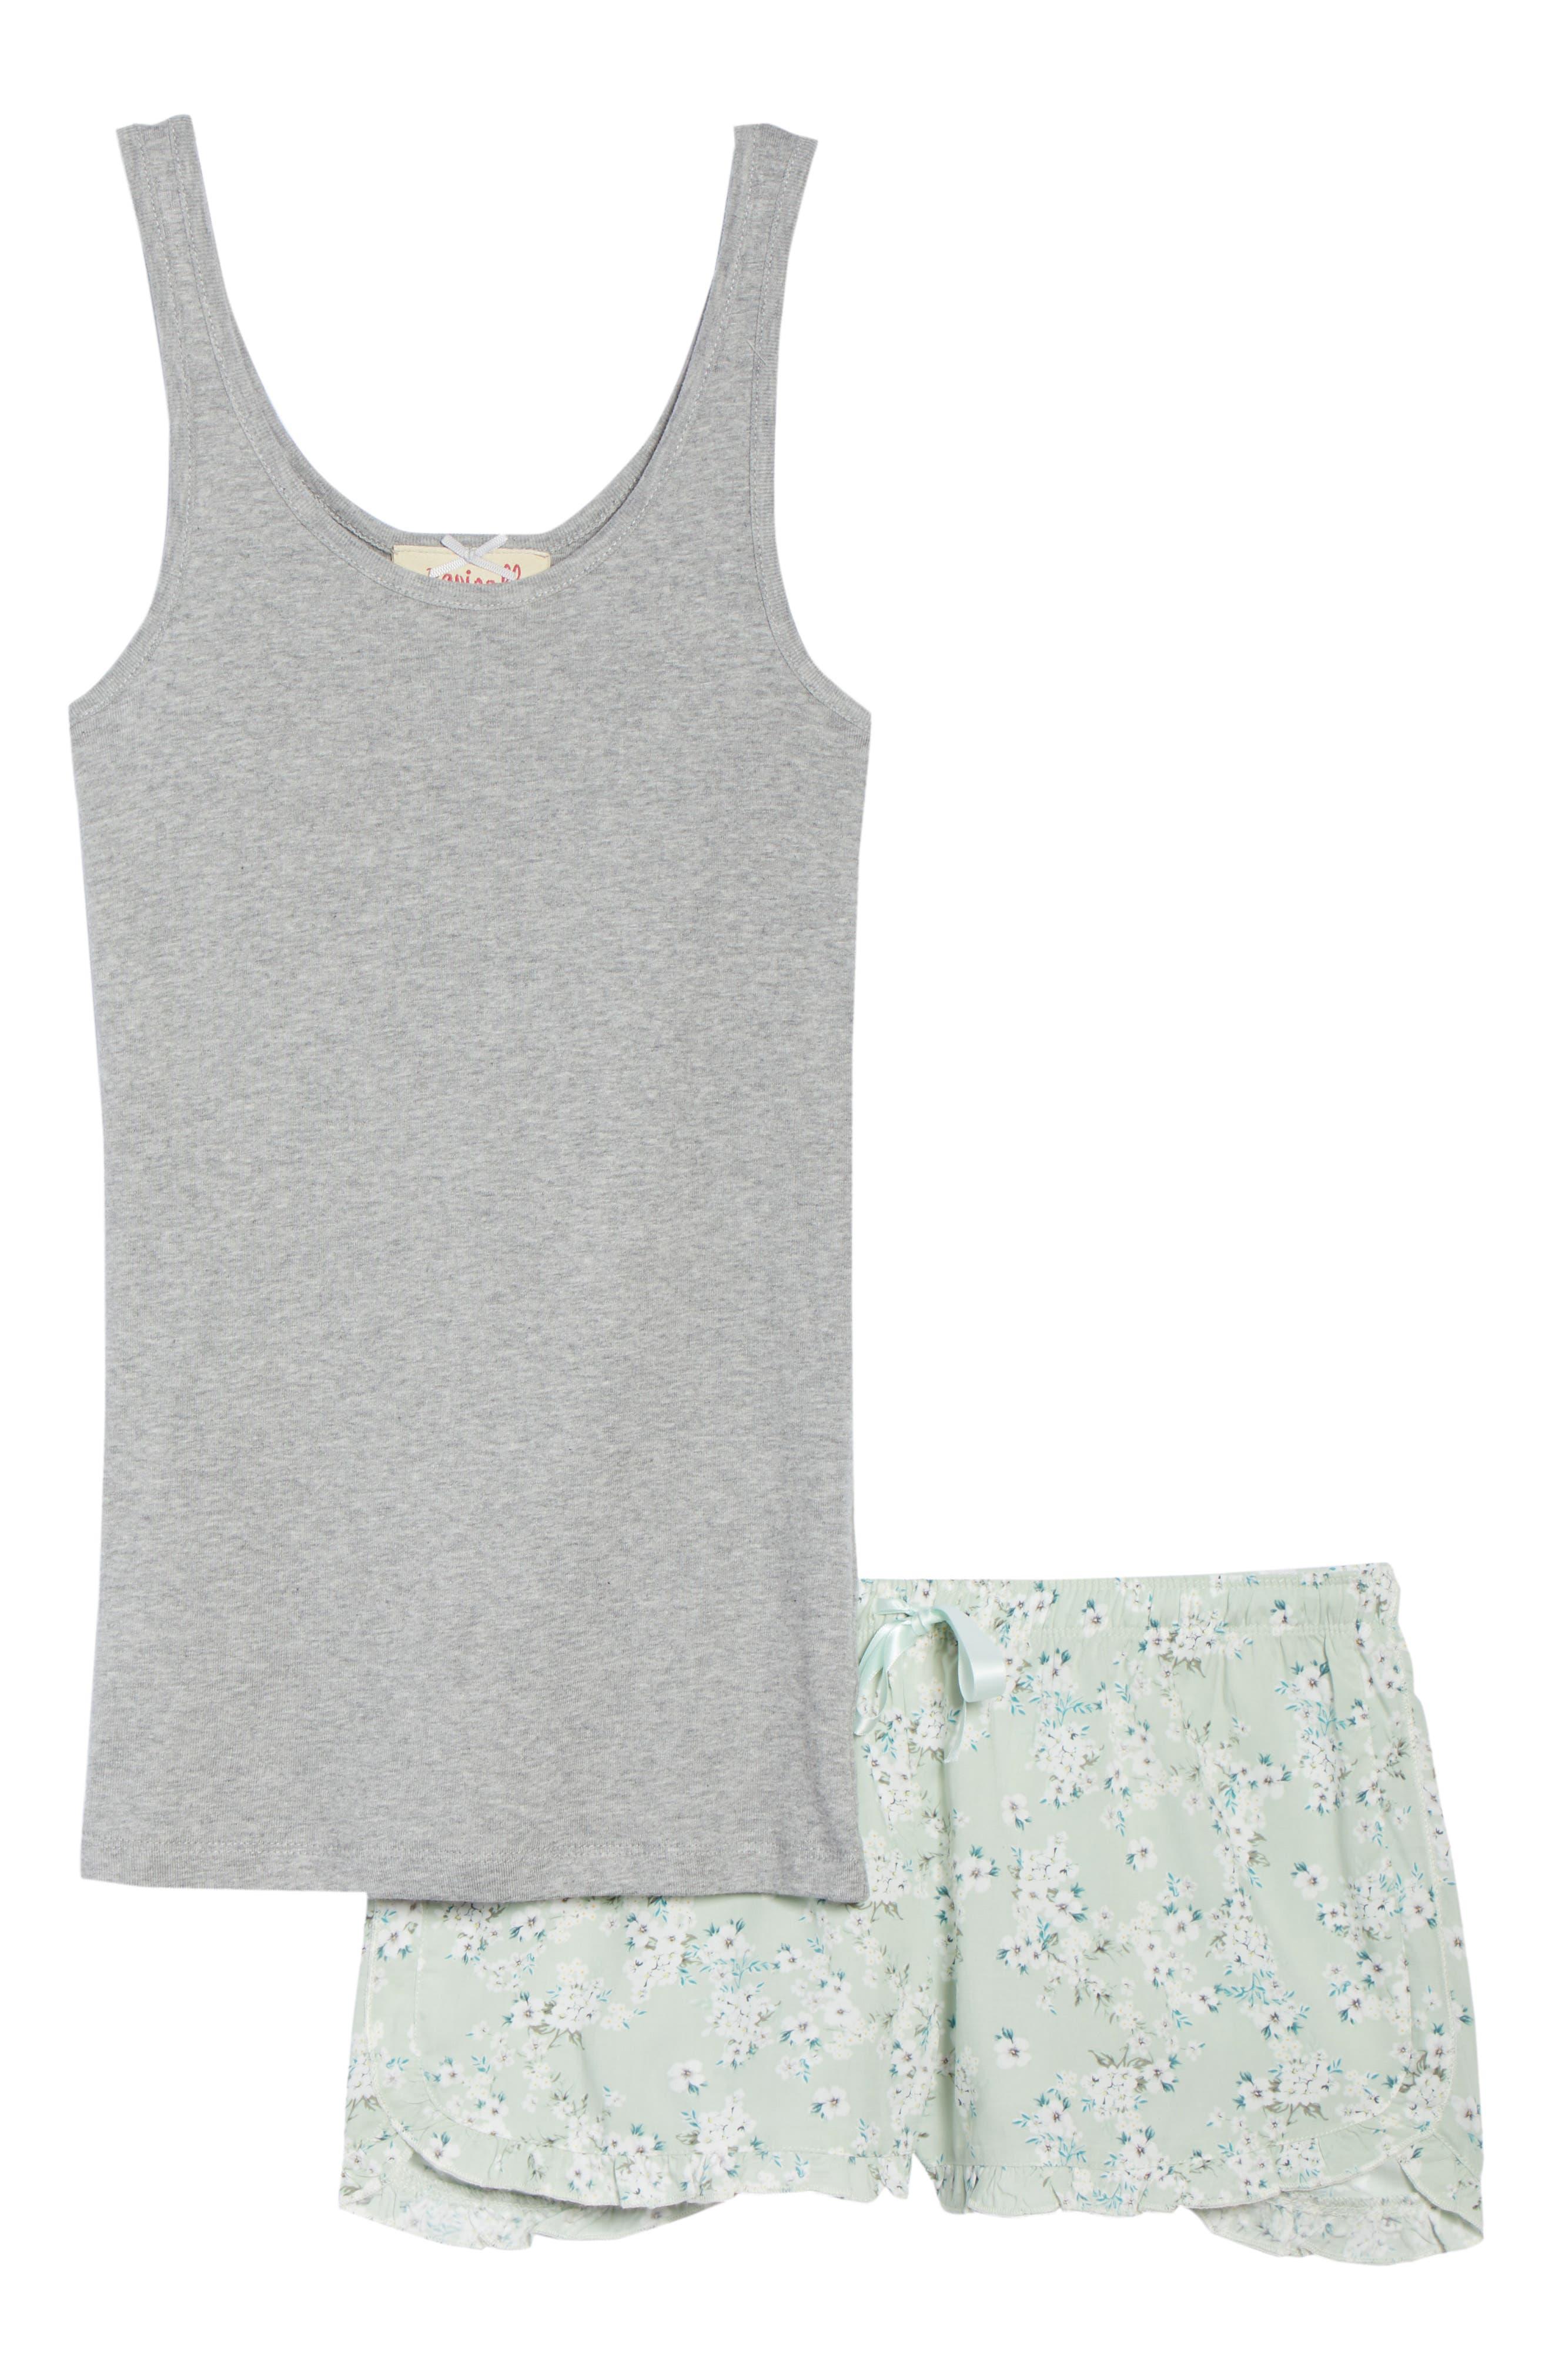 Tank & Boxers Pajamas,                             Alternate thumbnail 6, color,                             SAGE/ GREY